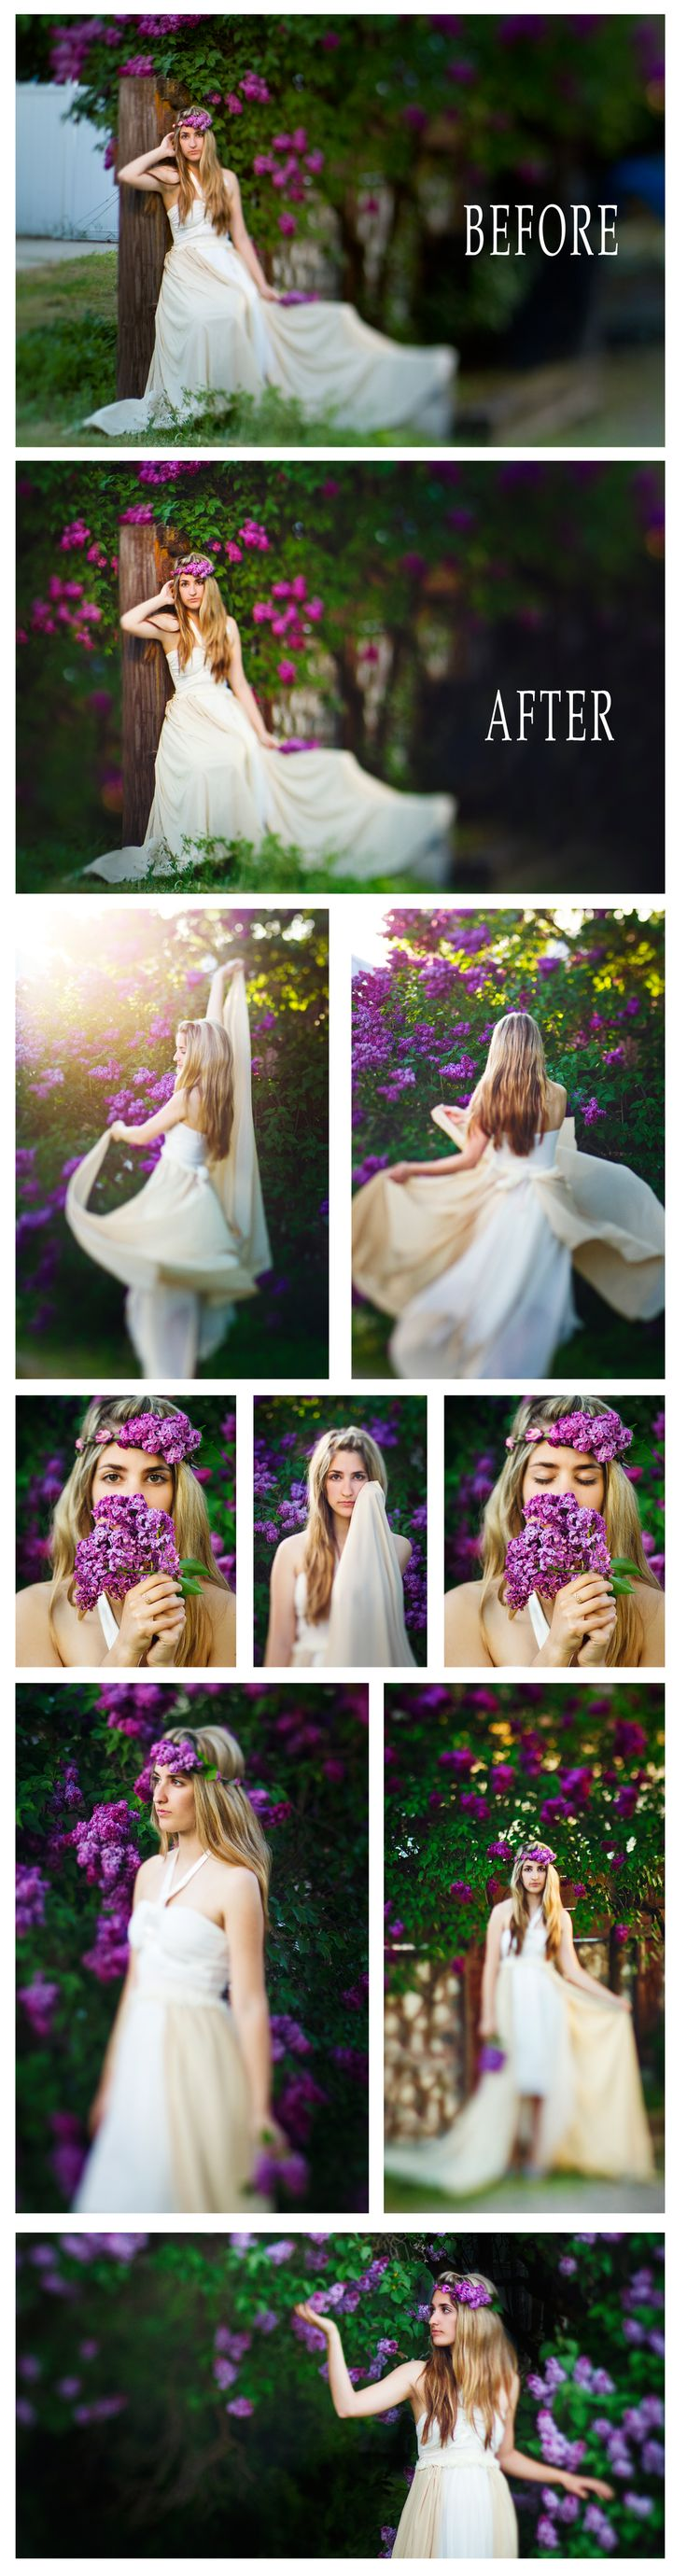 Lilac Princess photoshoot pixel perfect photography